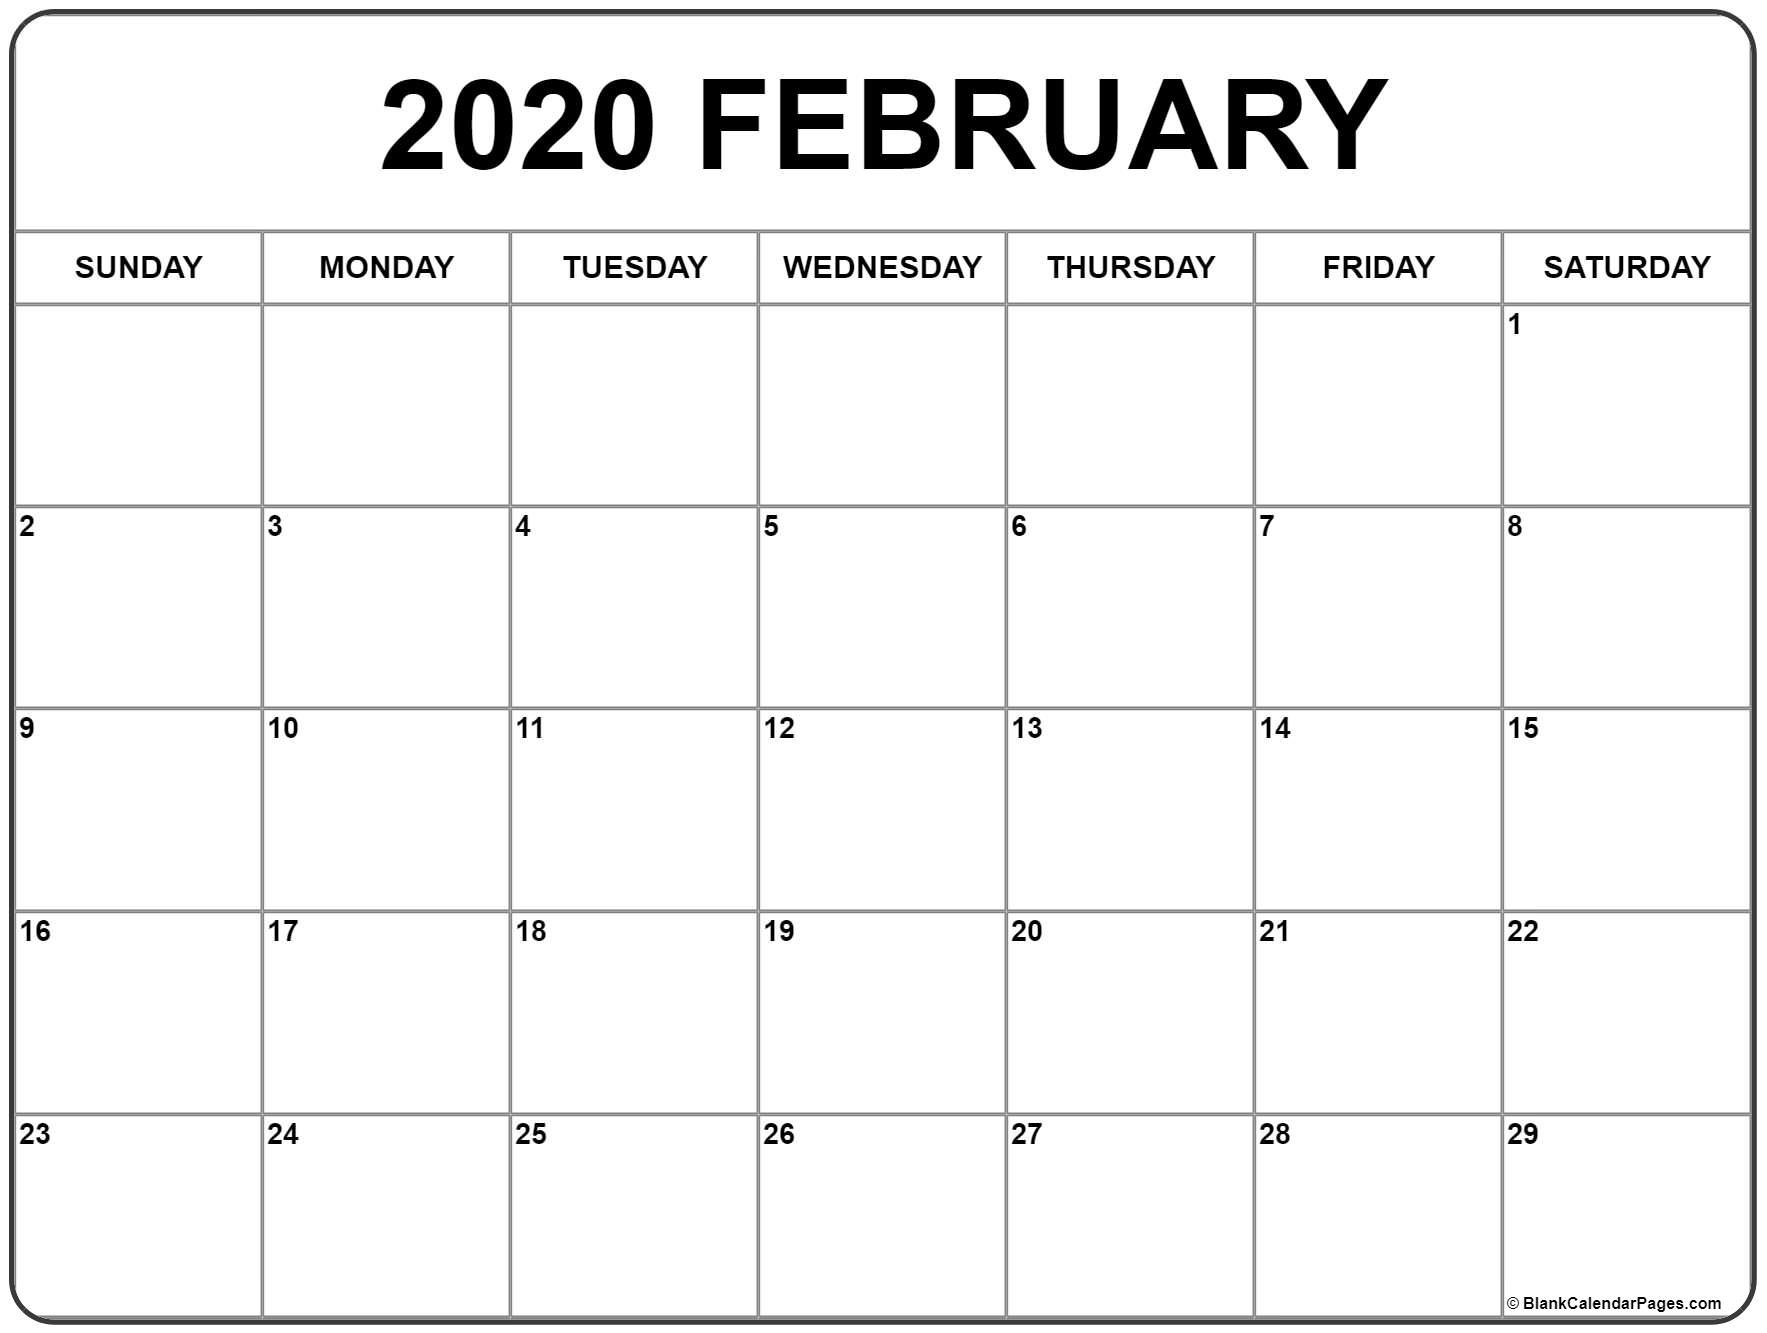 February 2020 Calendar | Free Printable Monthly Calendars within Free Printable 2020 Calendar With Space To Write